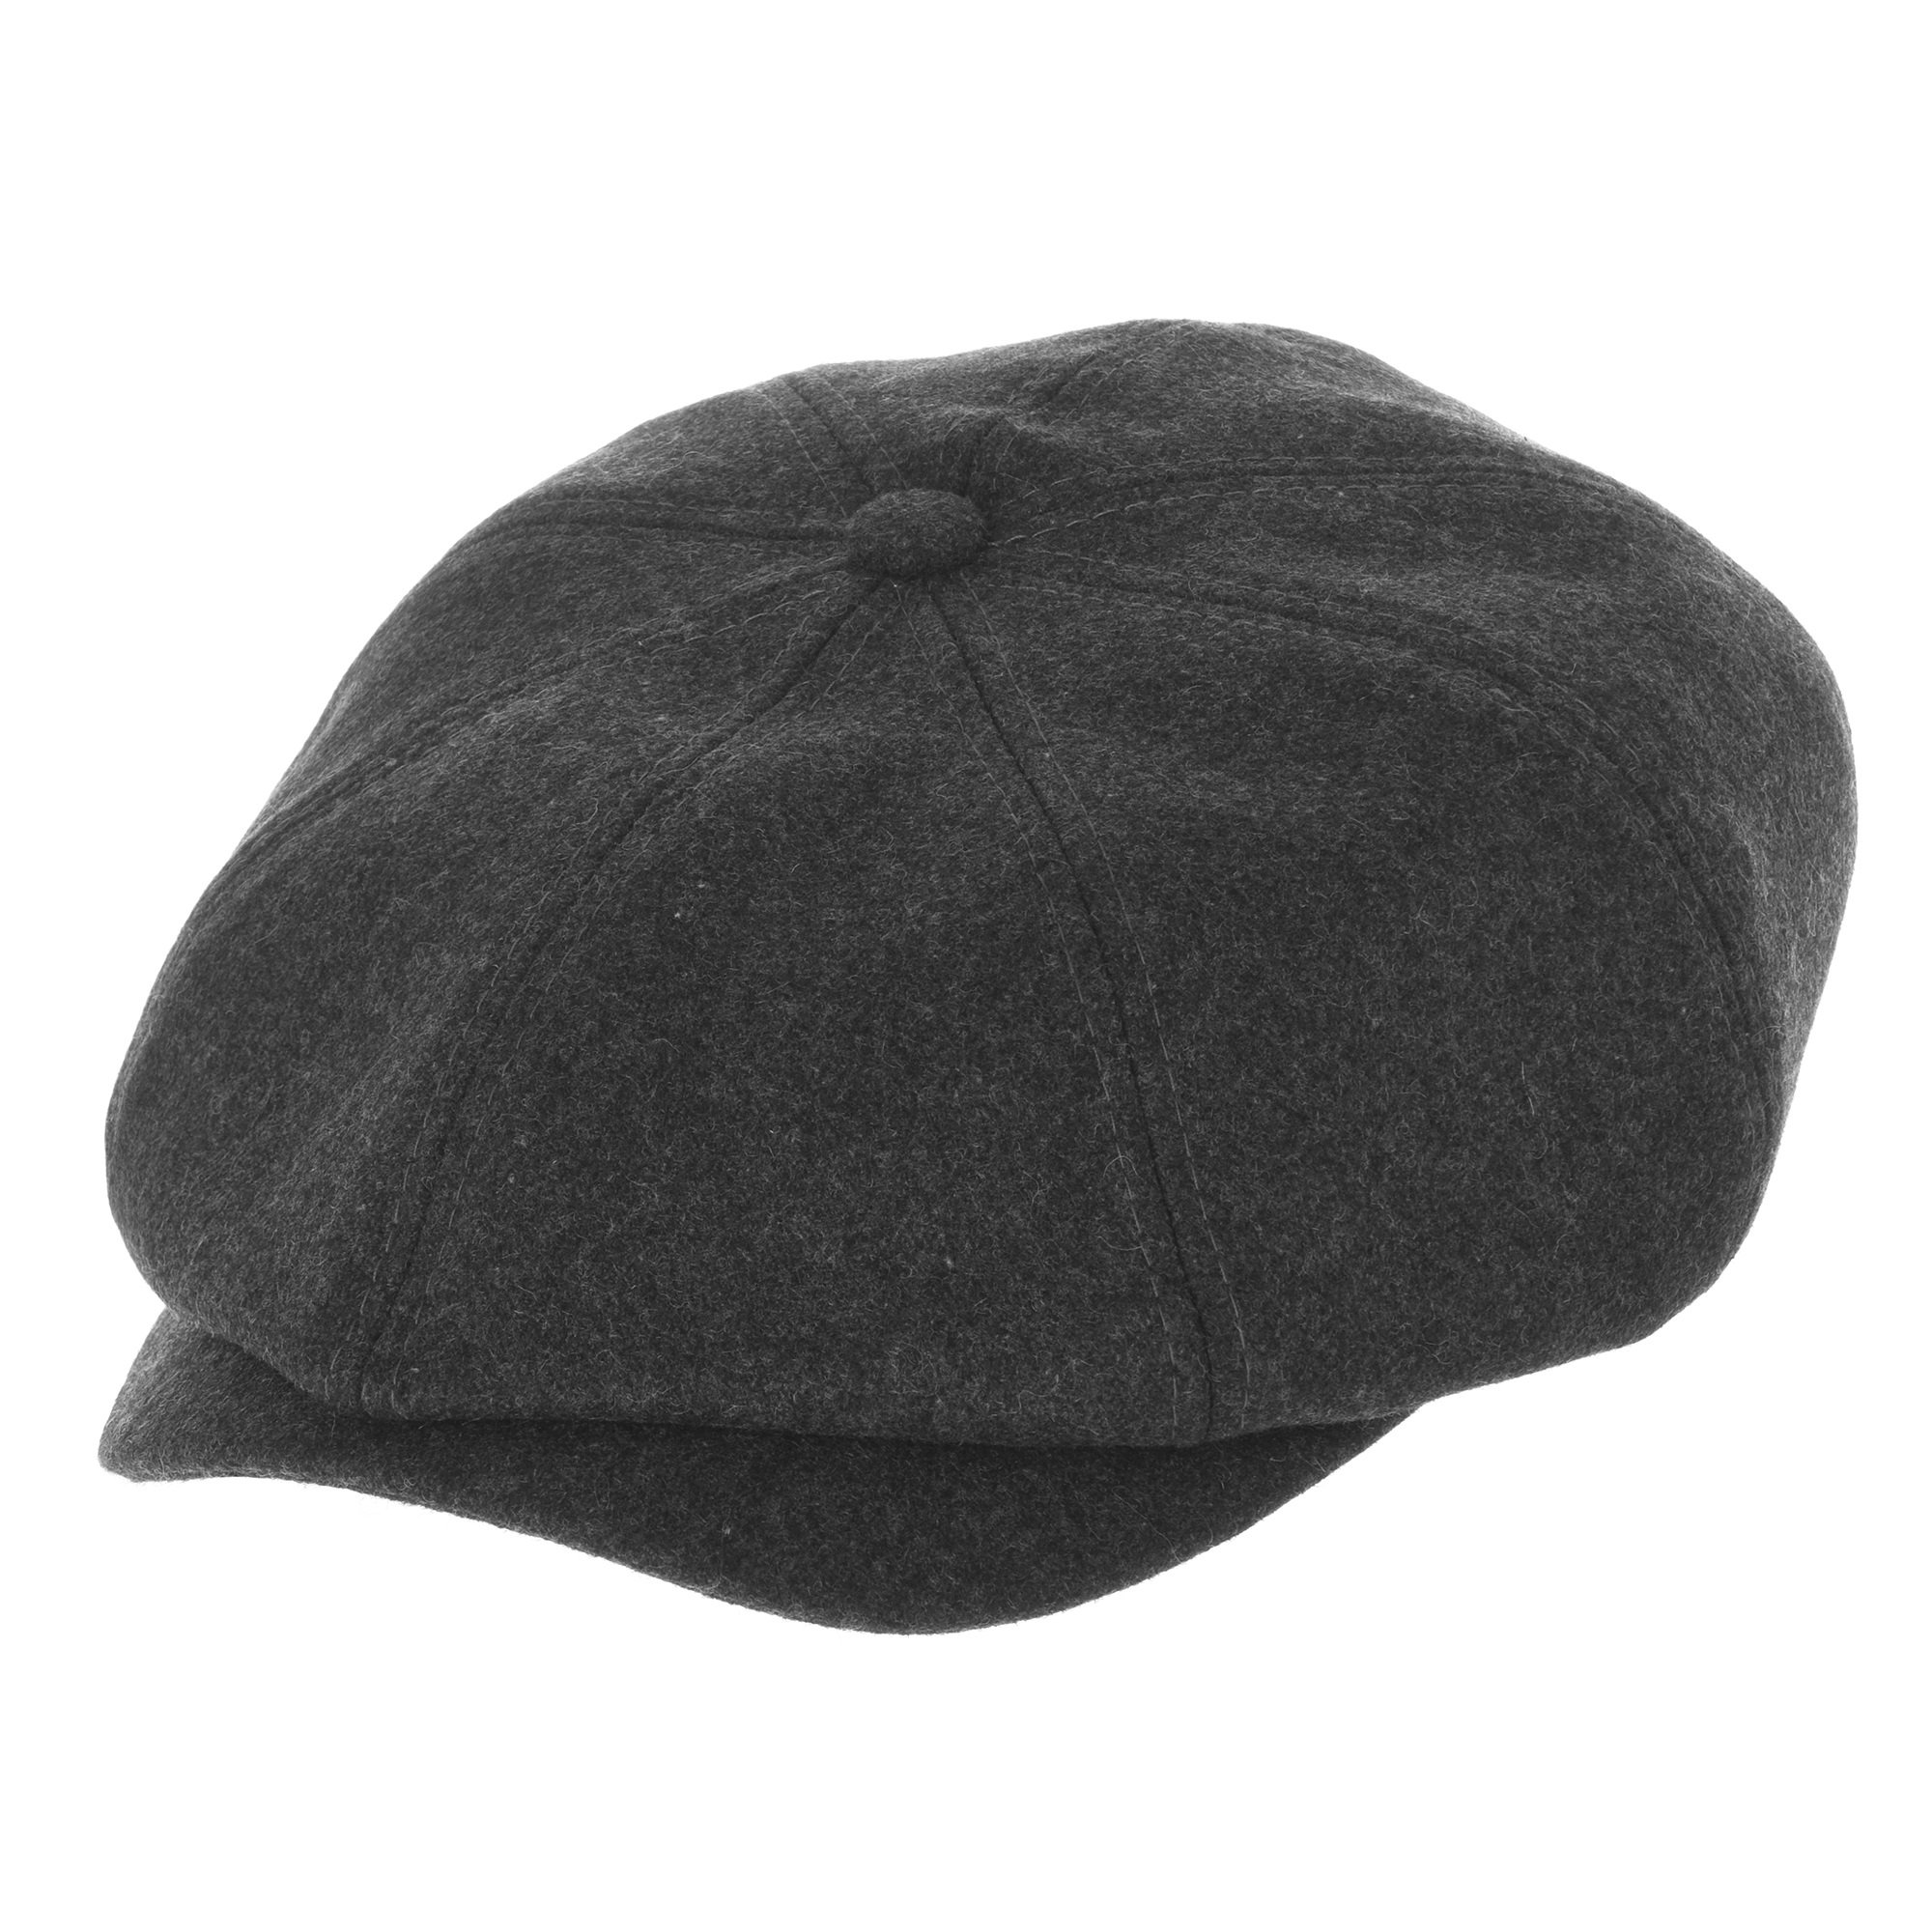 WITHMOONS Sombreros Gorras Boinas Bombines Newsboy Hat Wool Felt Simple  Gatsby Ivy Cap SL3458 product image 7fb8d55e54a